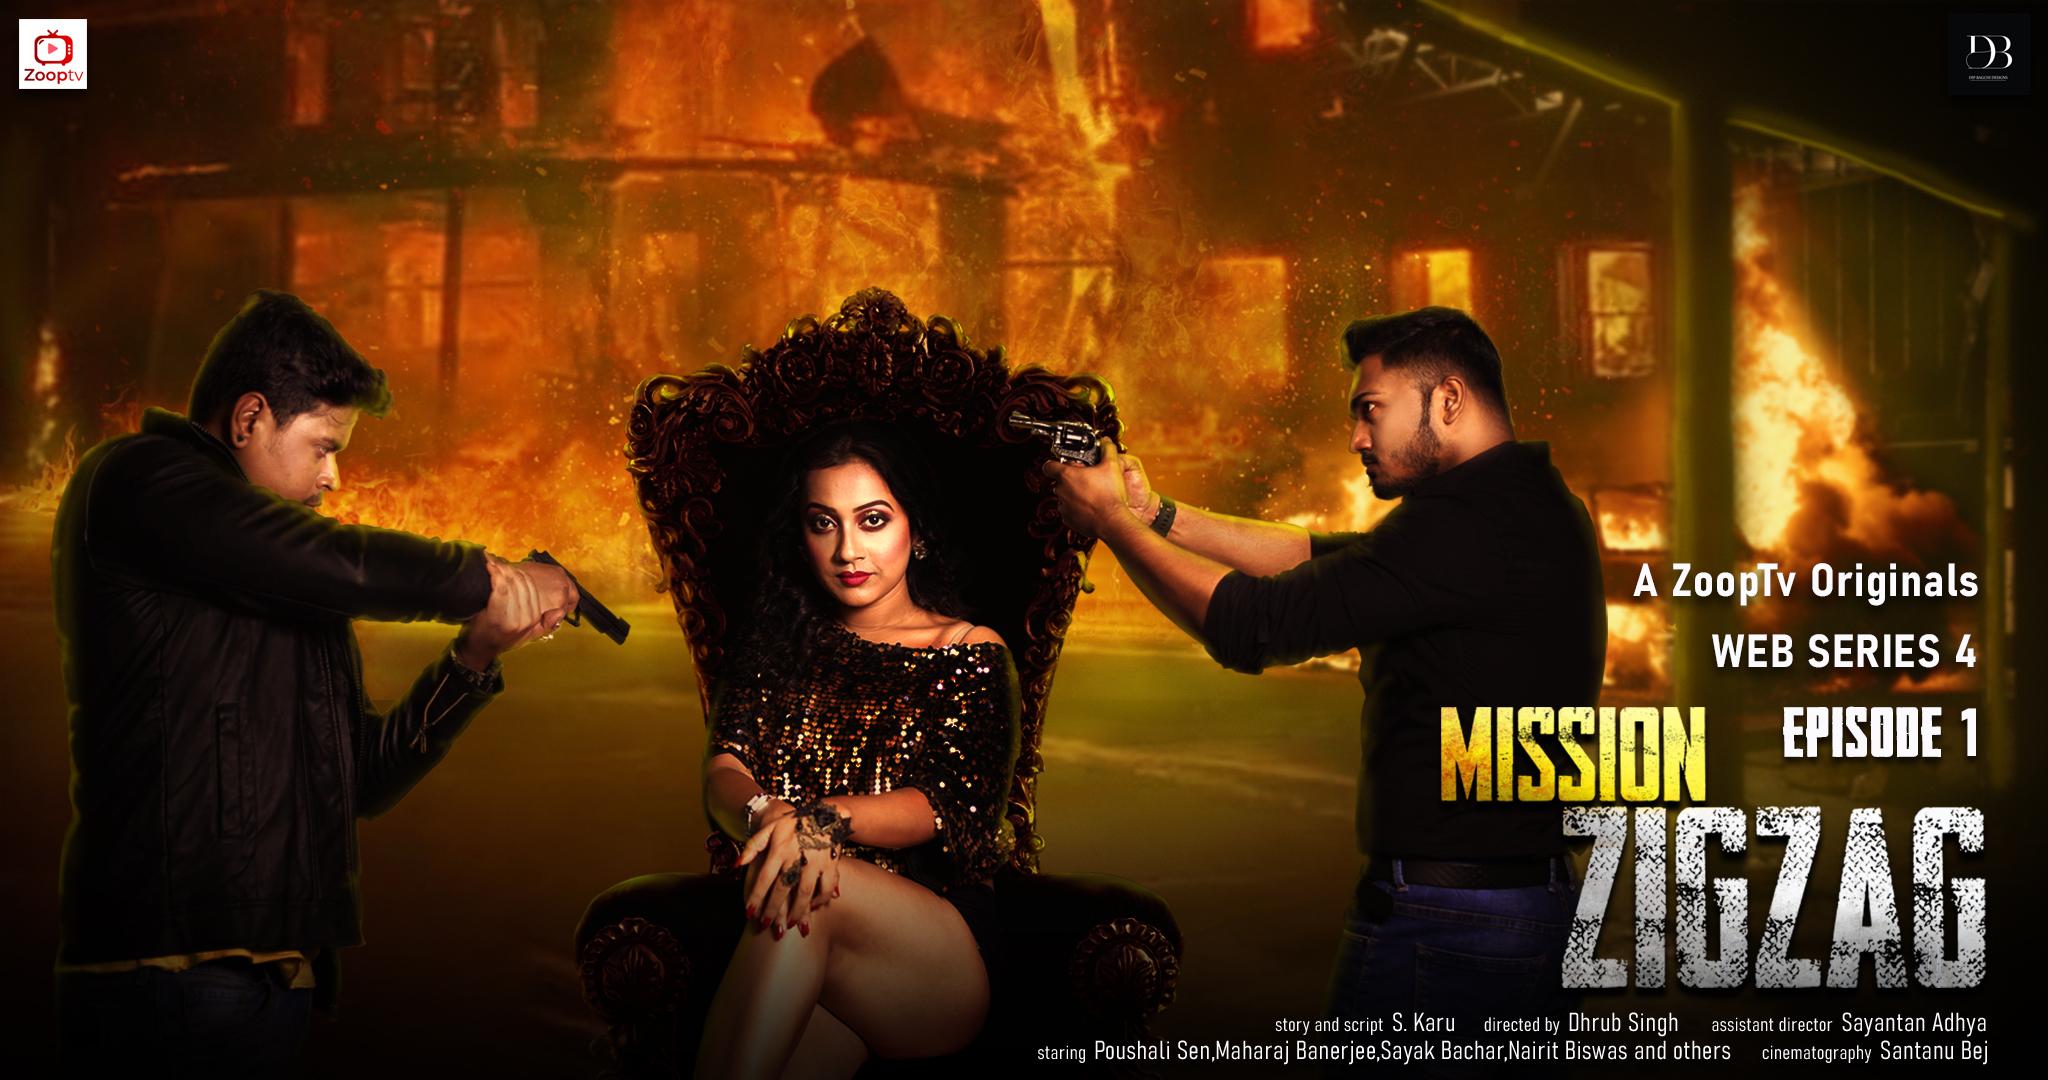 18+ Mission Zigzag Part 1 2021 ZoopTv Hindi Short Film 720p HDRip 100MB Download